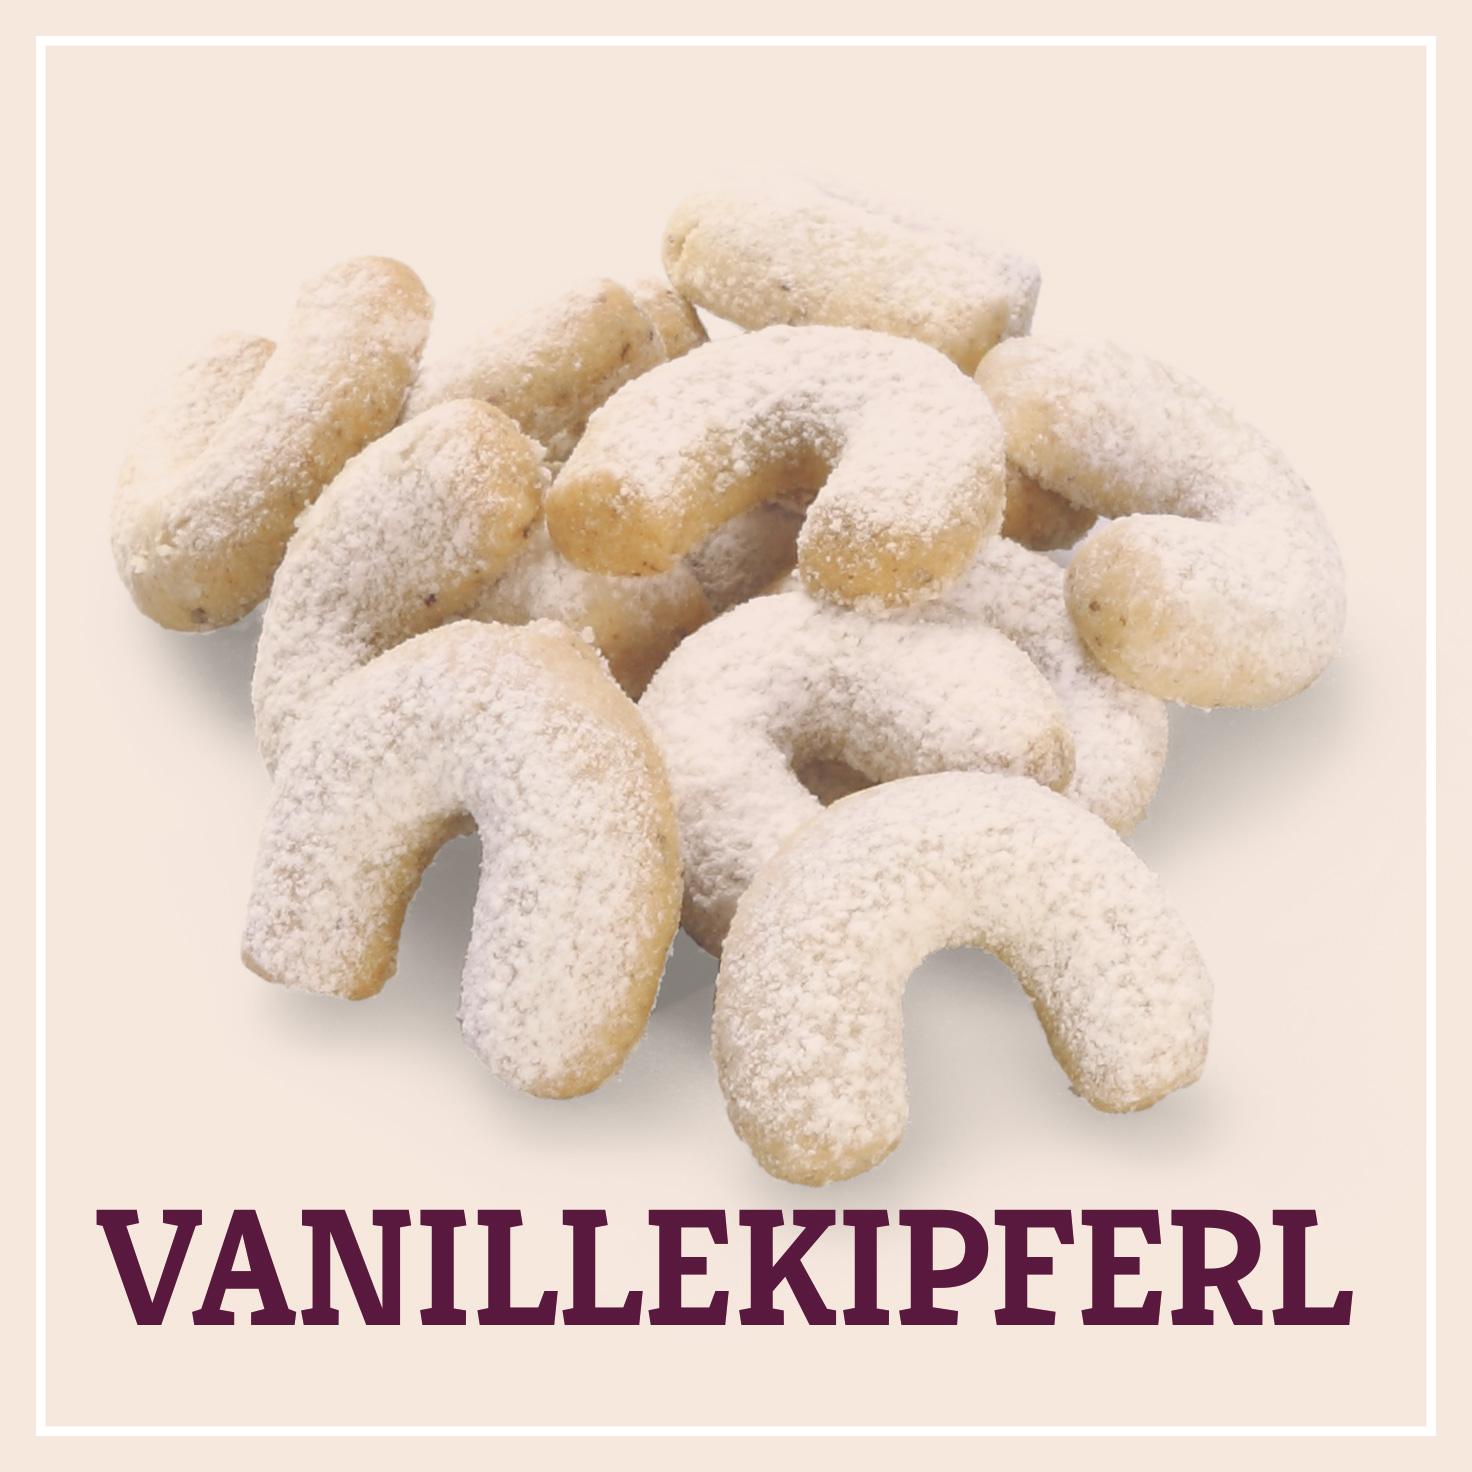 Heiss & Süß - Vanillekipferl